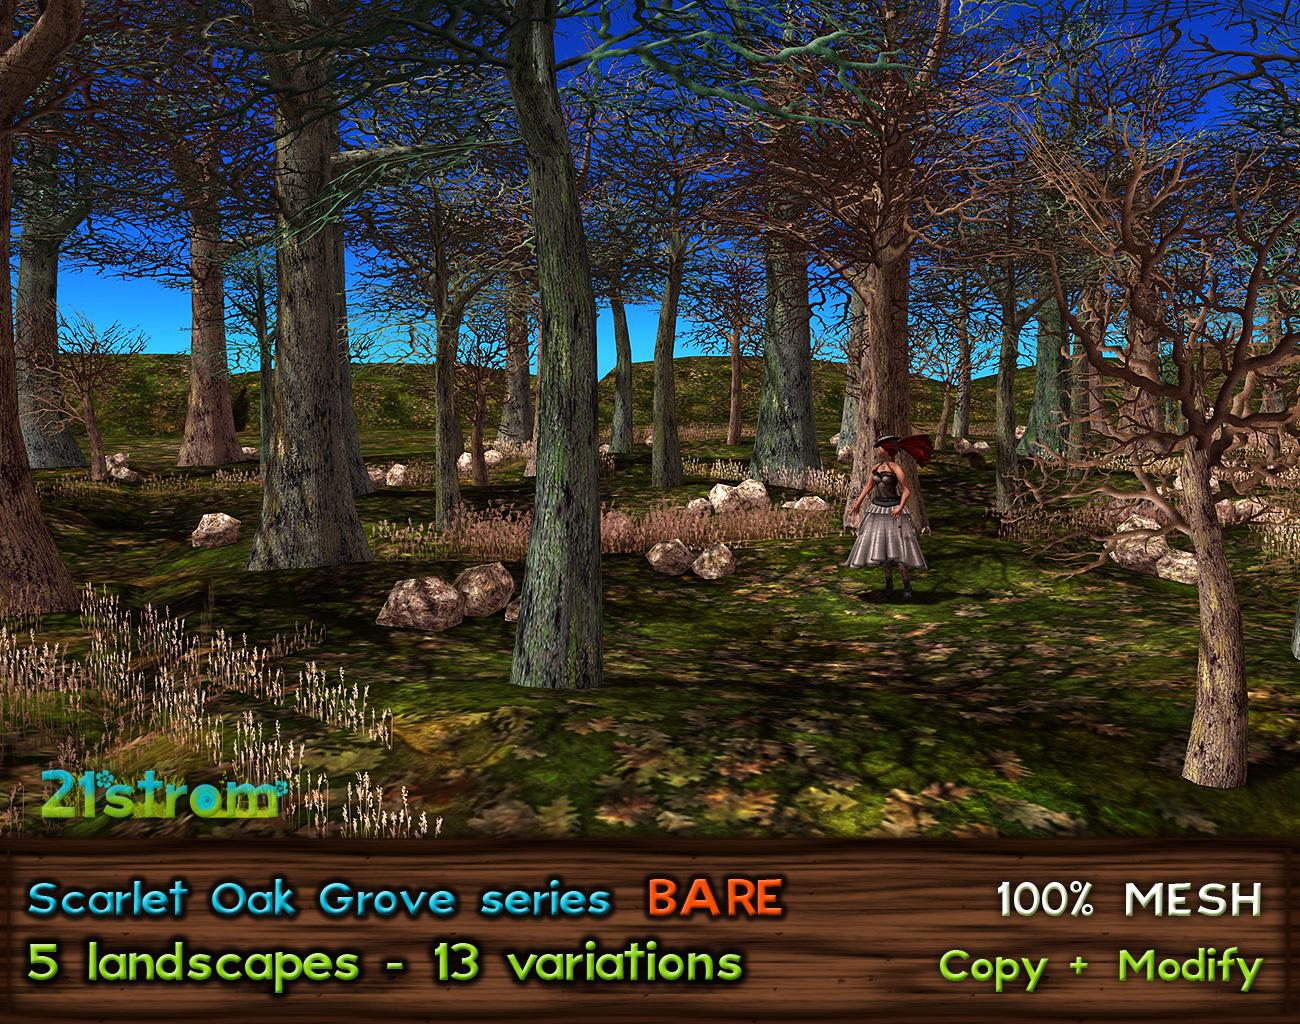 Scarlet Oak Grove Bare